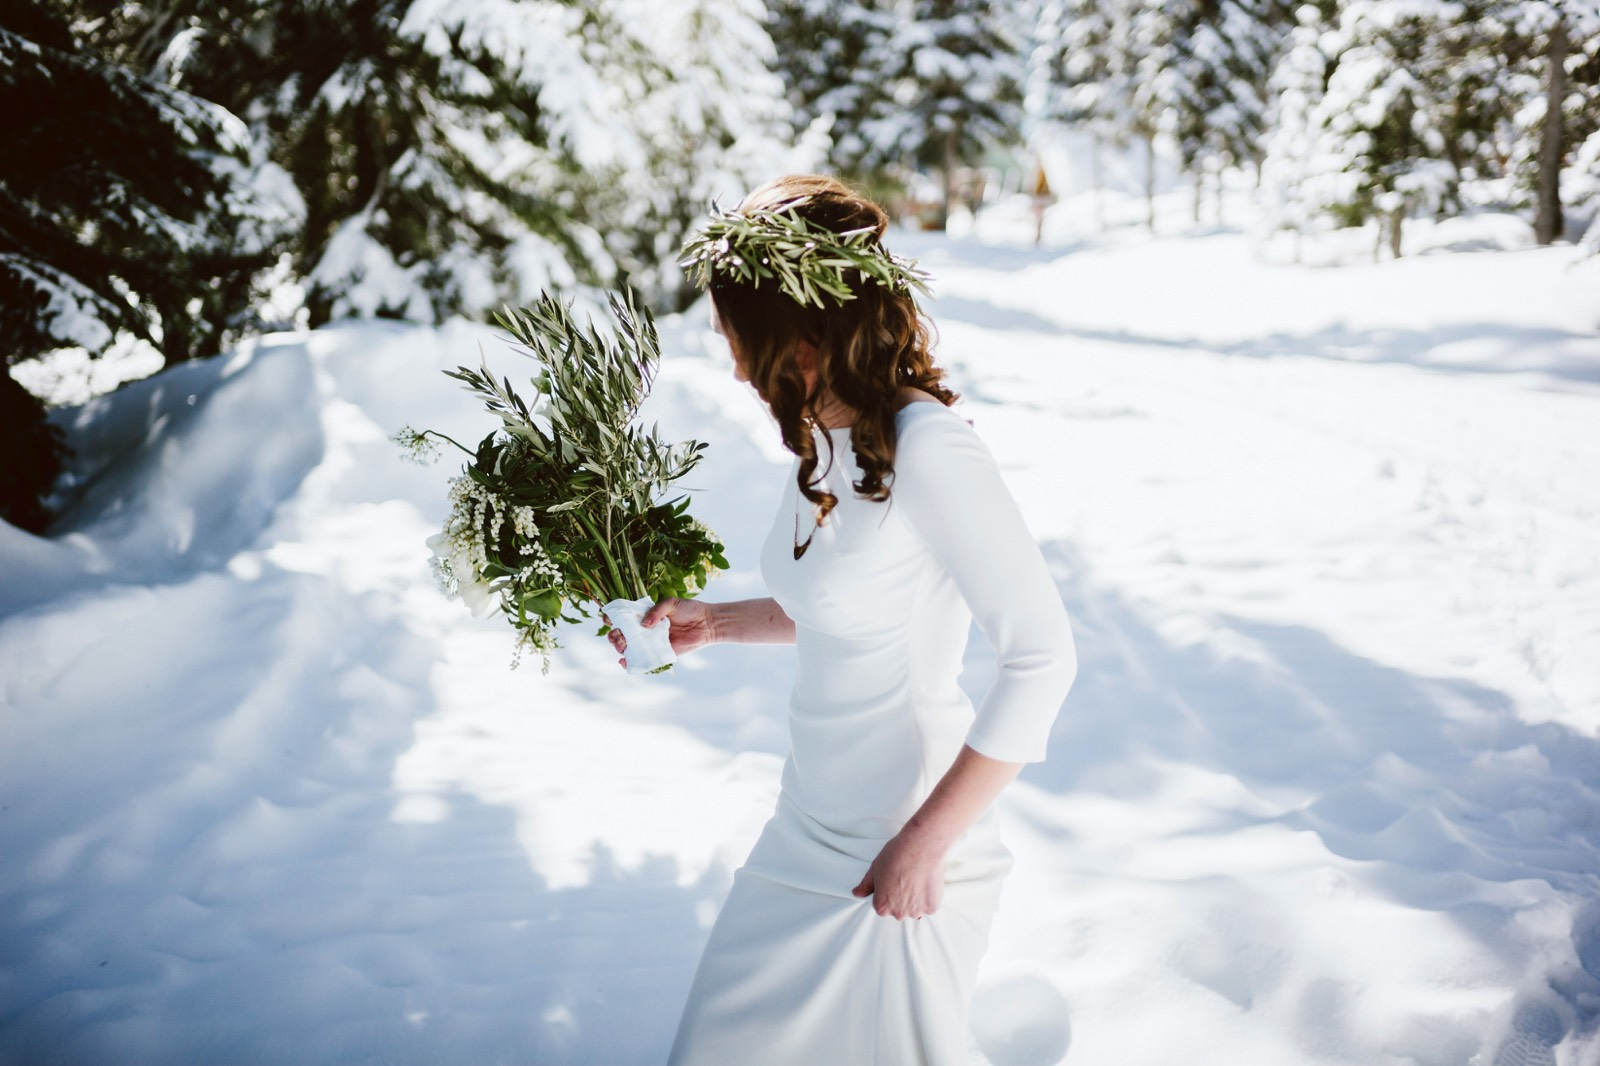 alpine-lakes-high-camp-winter-wedding-16 ALPINE LAKES HIGH CAMP WEDDING